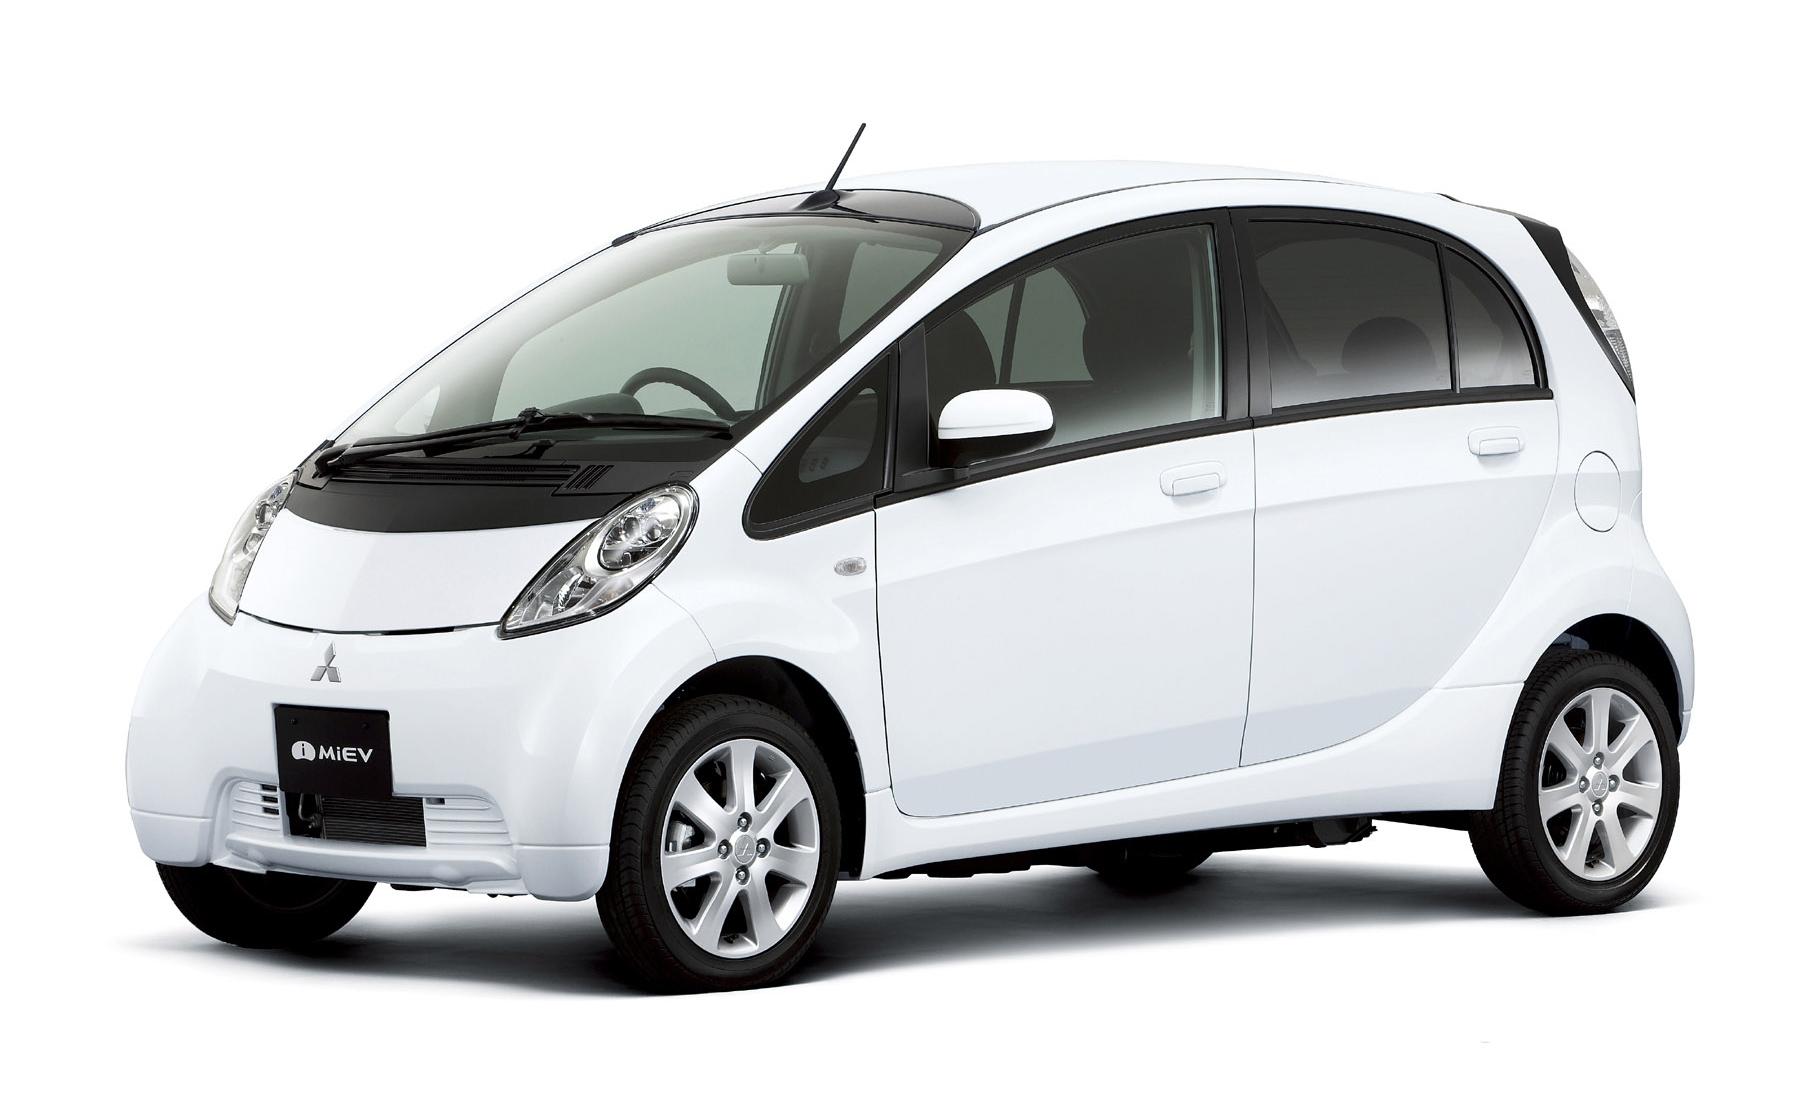 2009 Mitsubishi i-MiEV